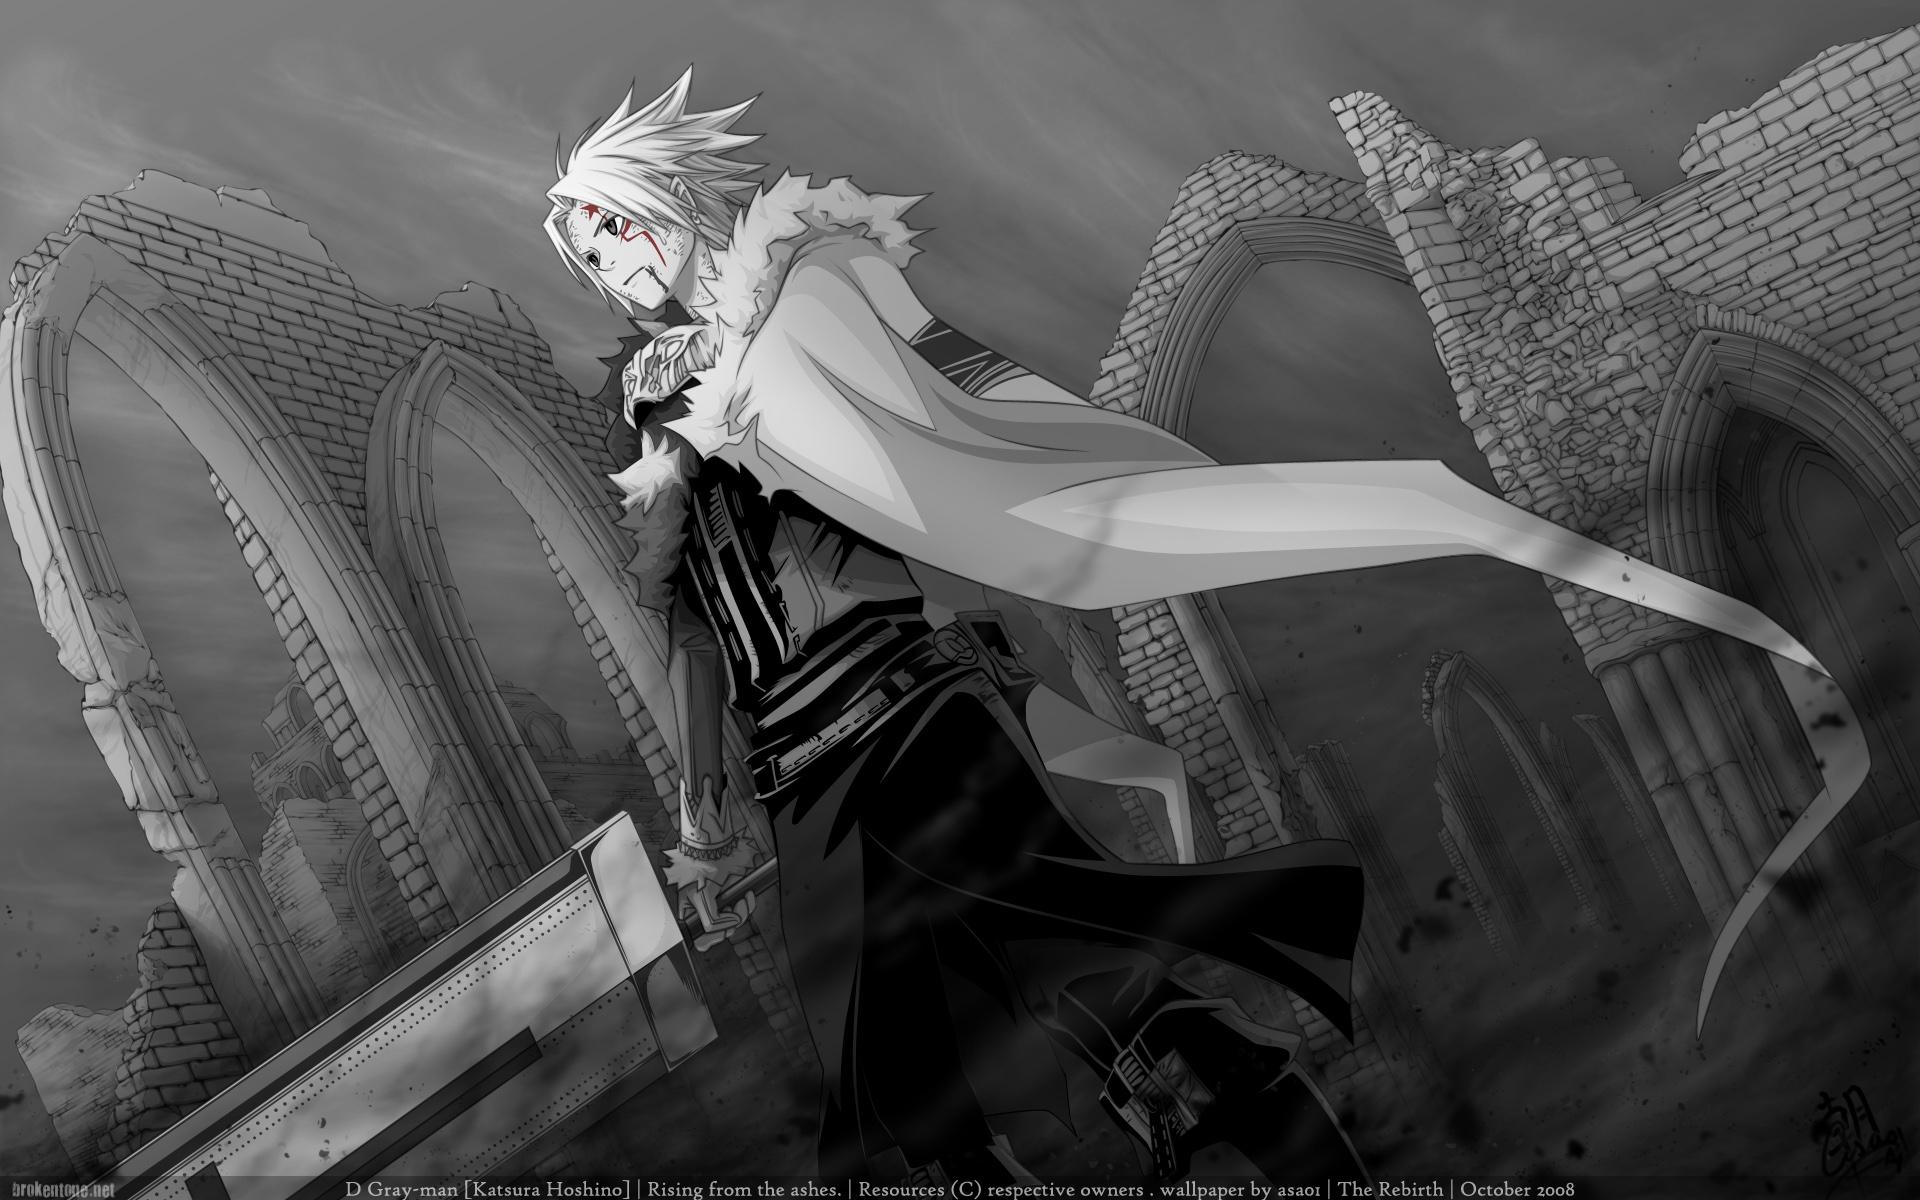 100 Wallpapers de anime HD Anime-men-with-blade_1920x1200